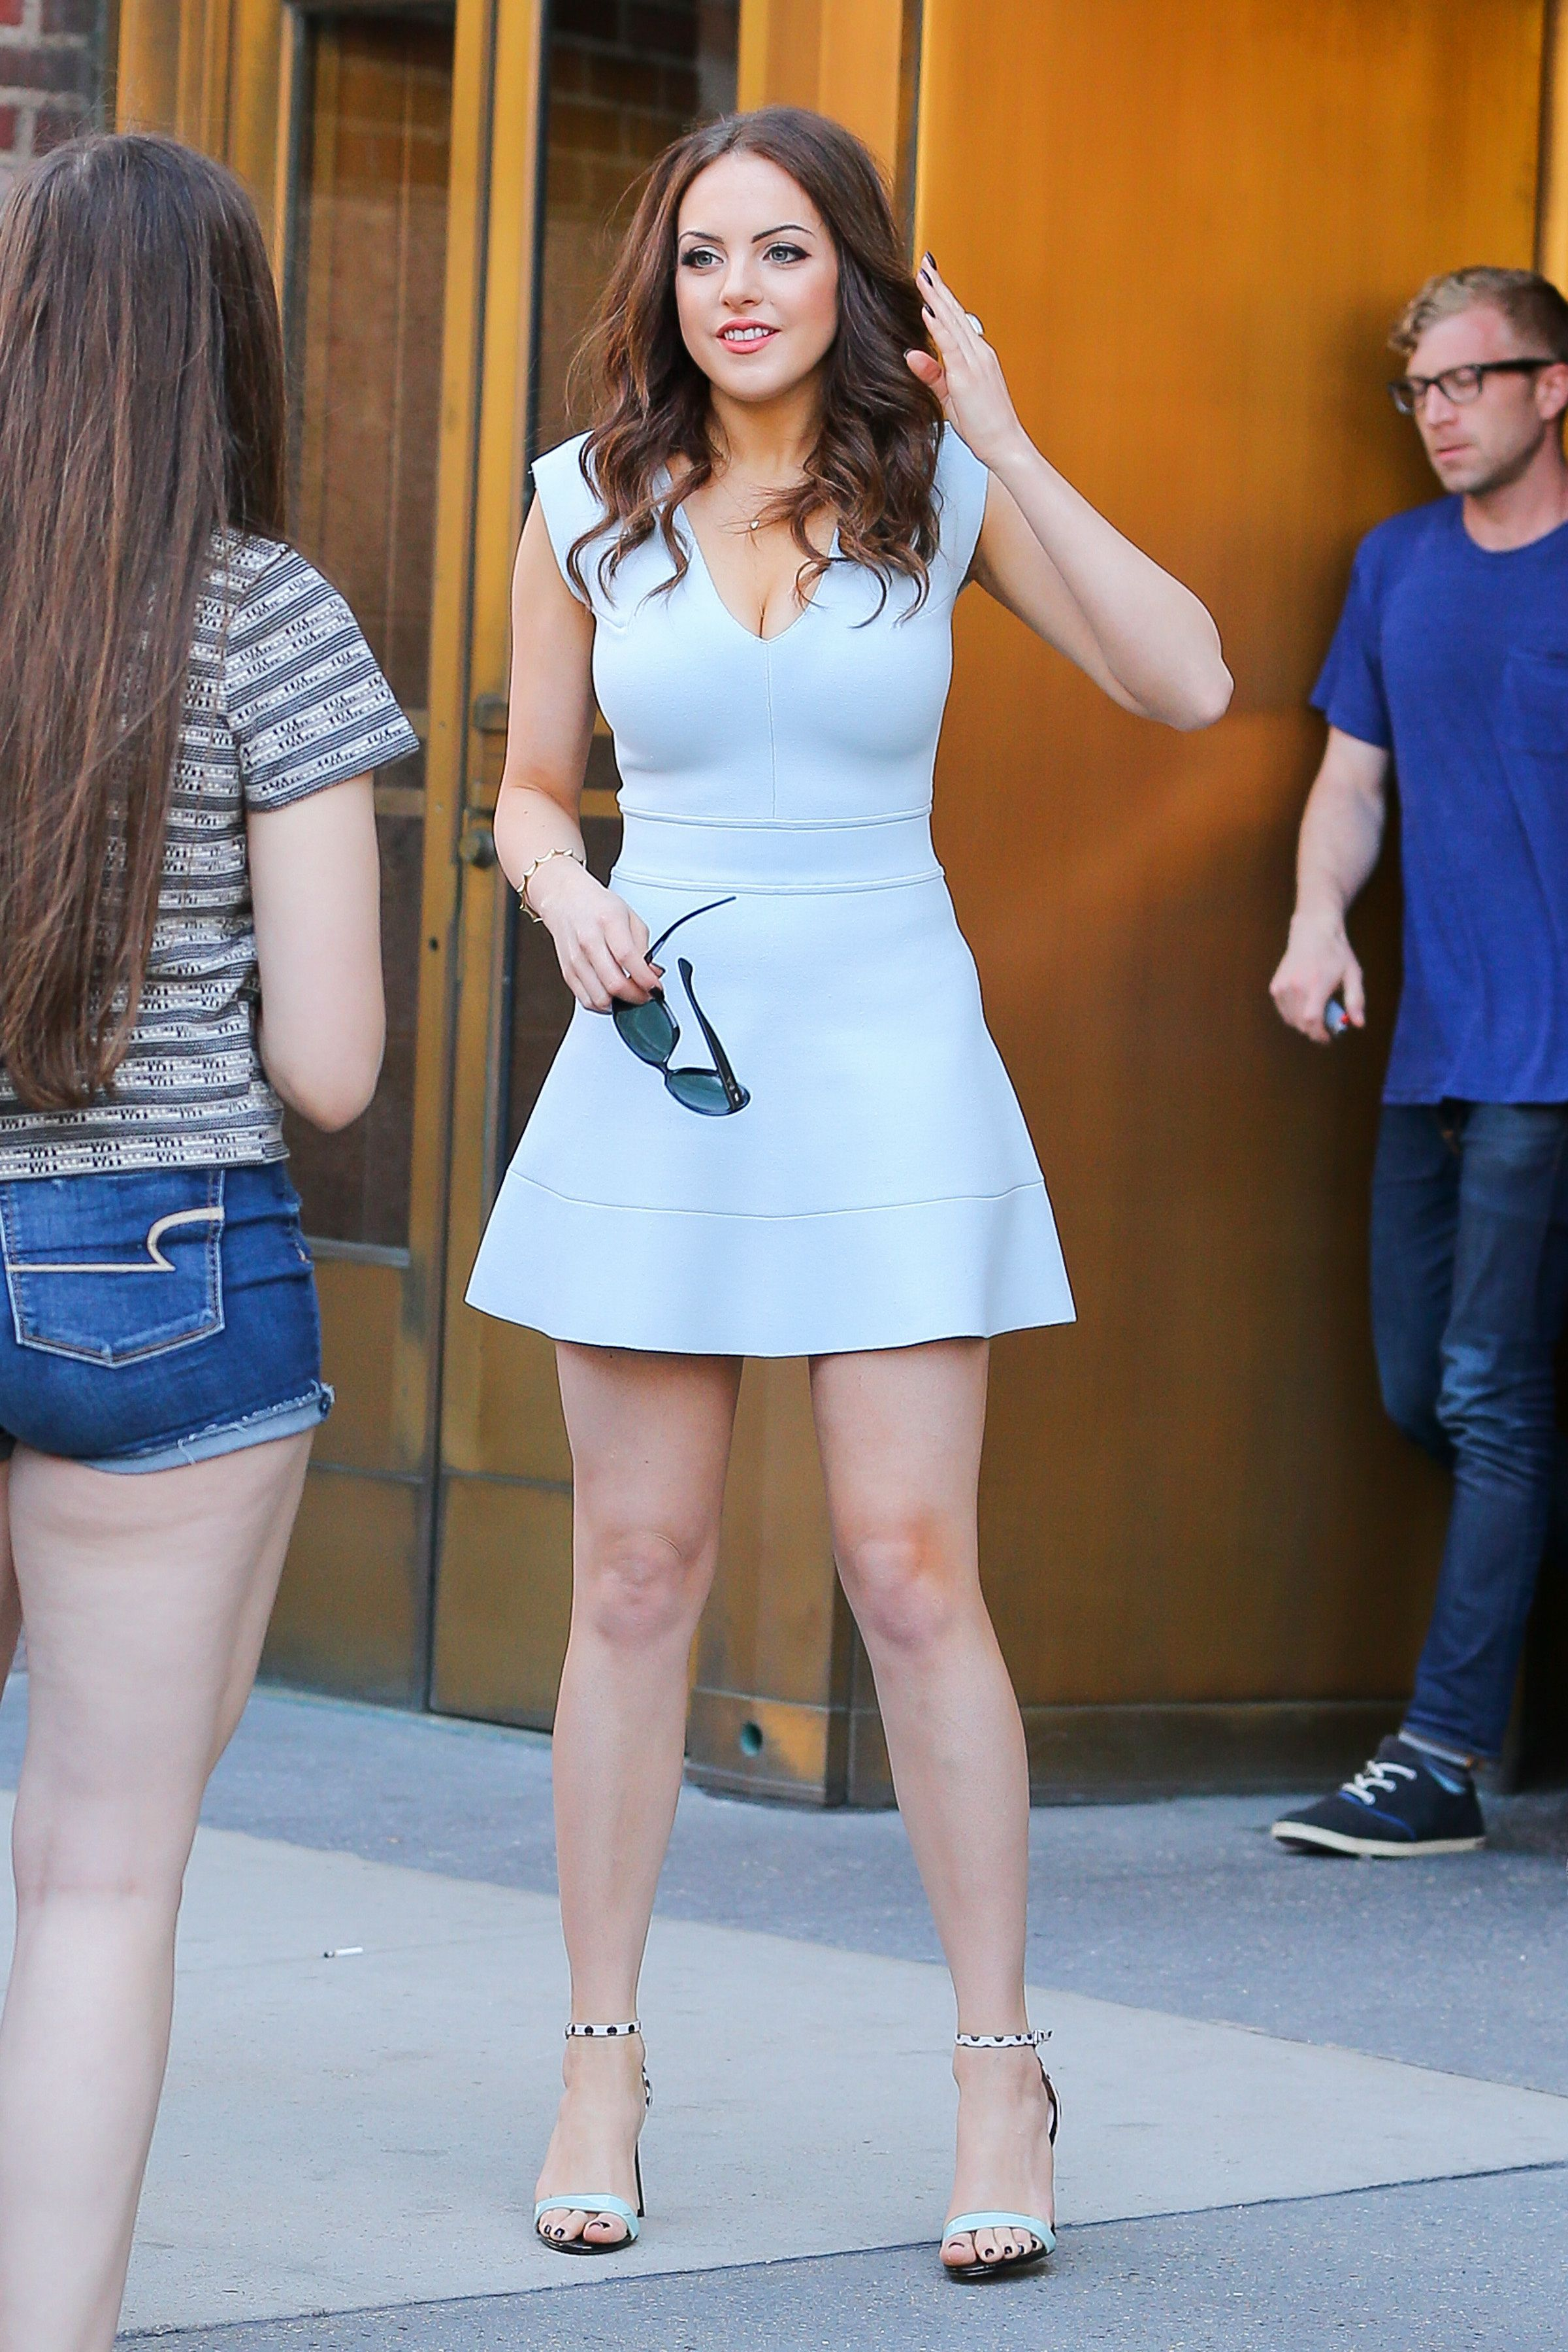 Elizabeth Gillies Actress Actresses Movie Movies Film Films Celeb